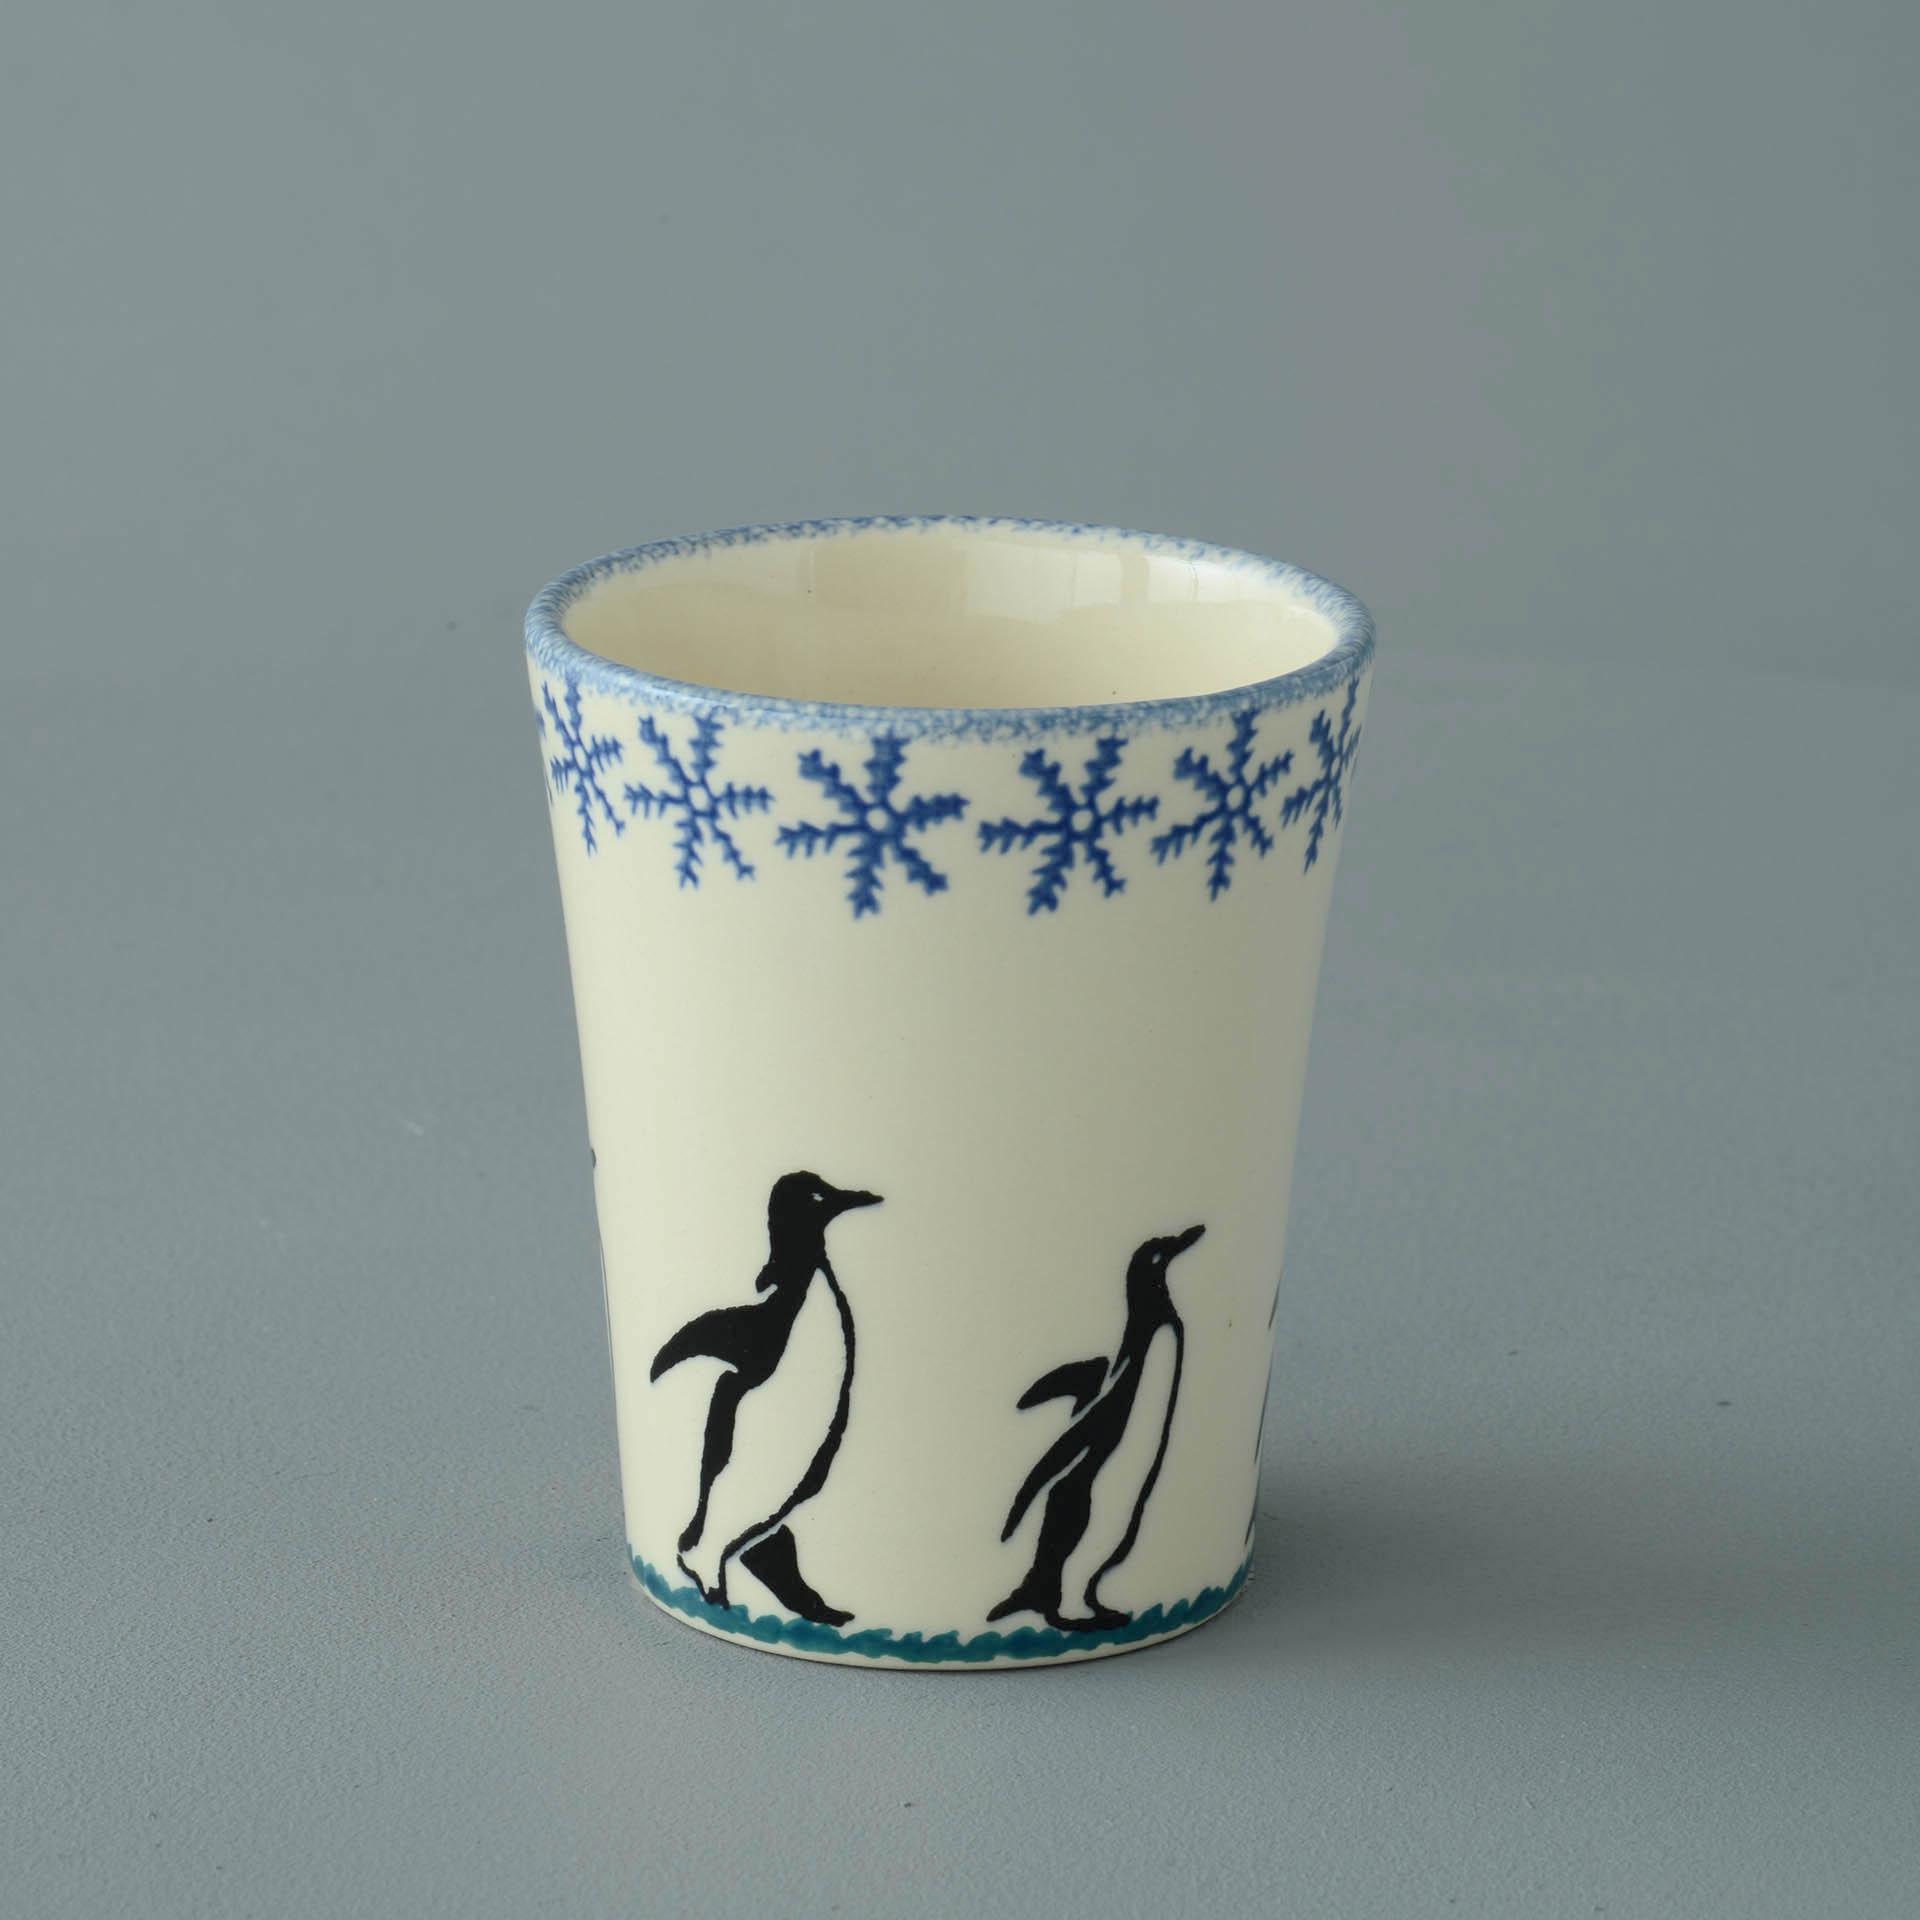 Penguin Bathroom Beaker 8(dia) x 9(h) cm.